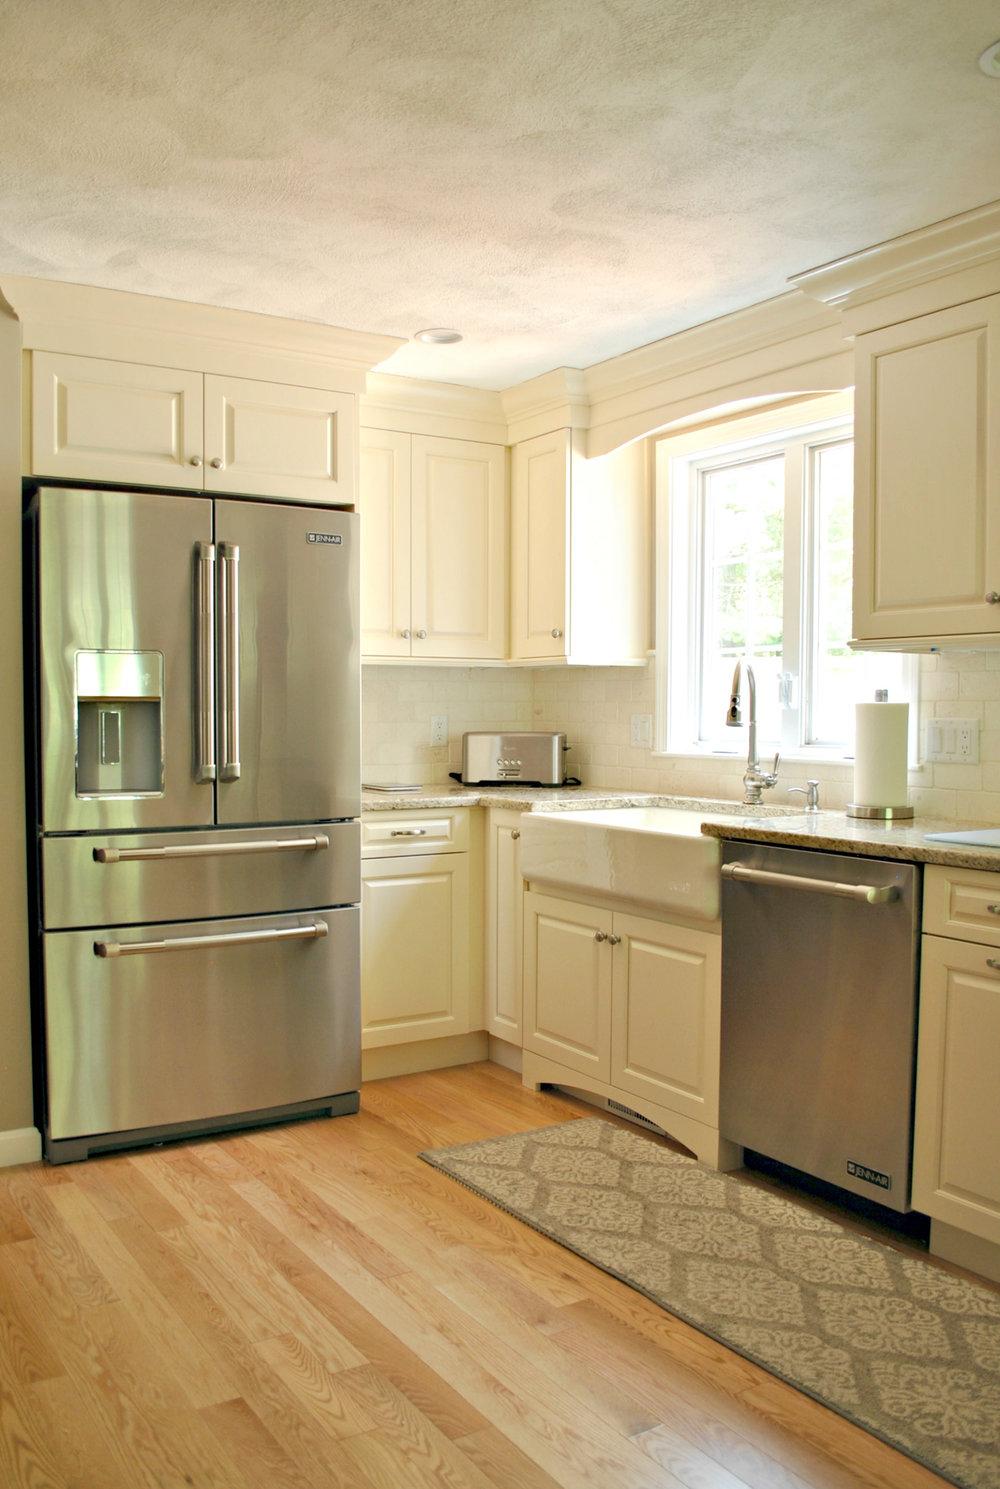 blog kitchen associates massachusetts kitchen remodeling kitchen makeover in billerica ma